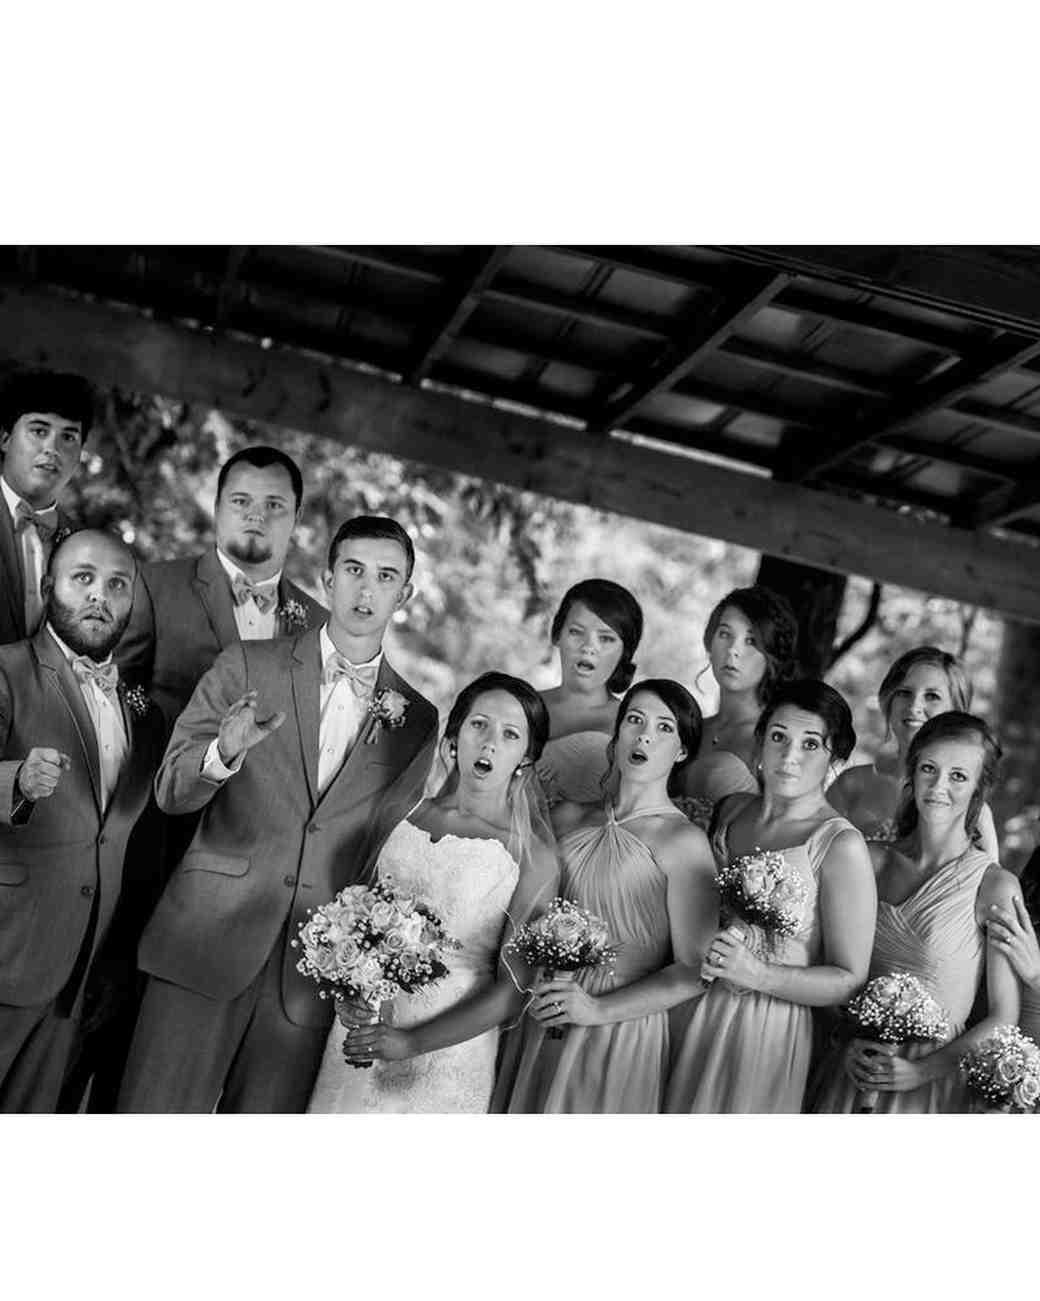 hilarious-wedding-photos-reaction-shot-falling-camera-1115.jpg